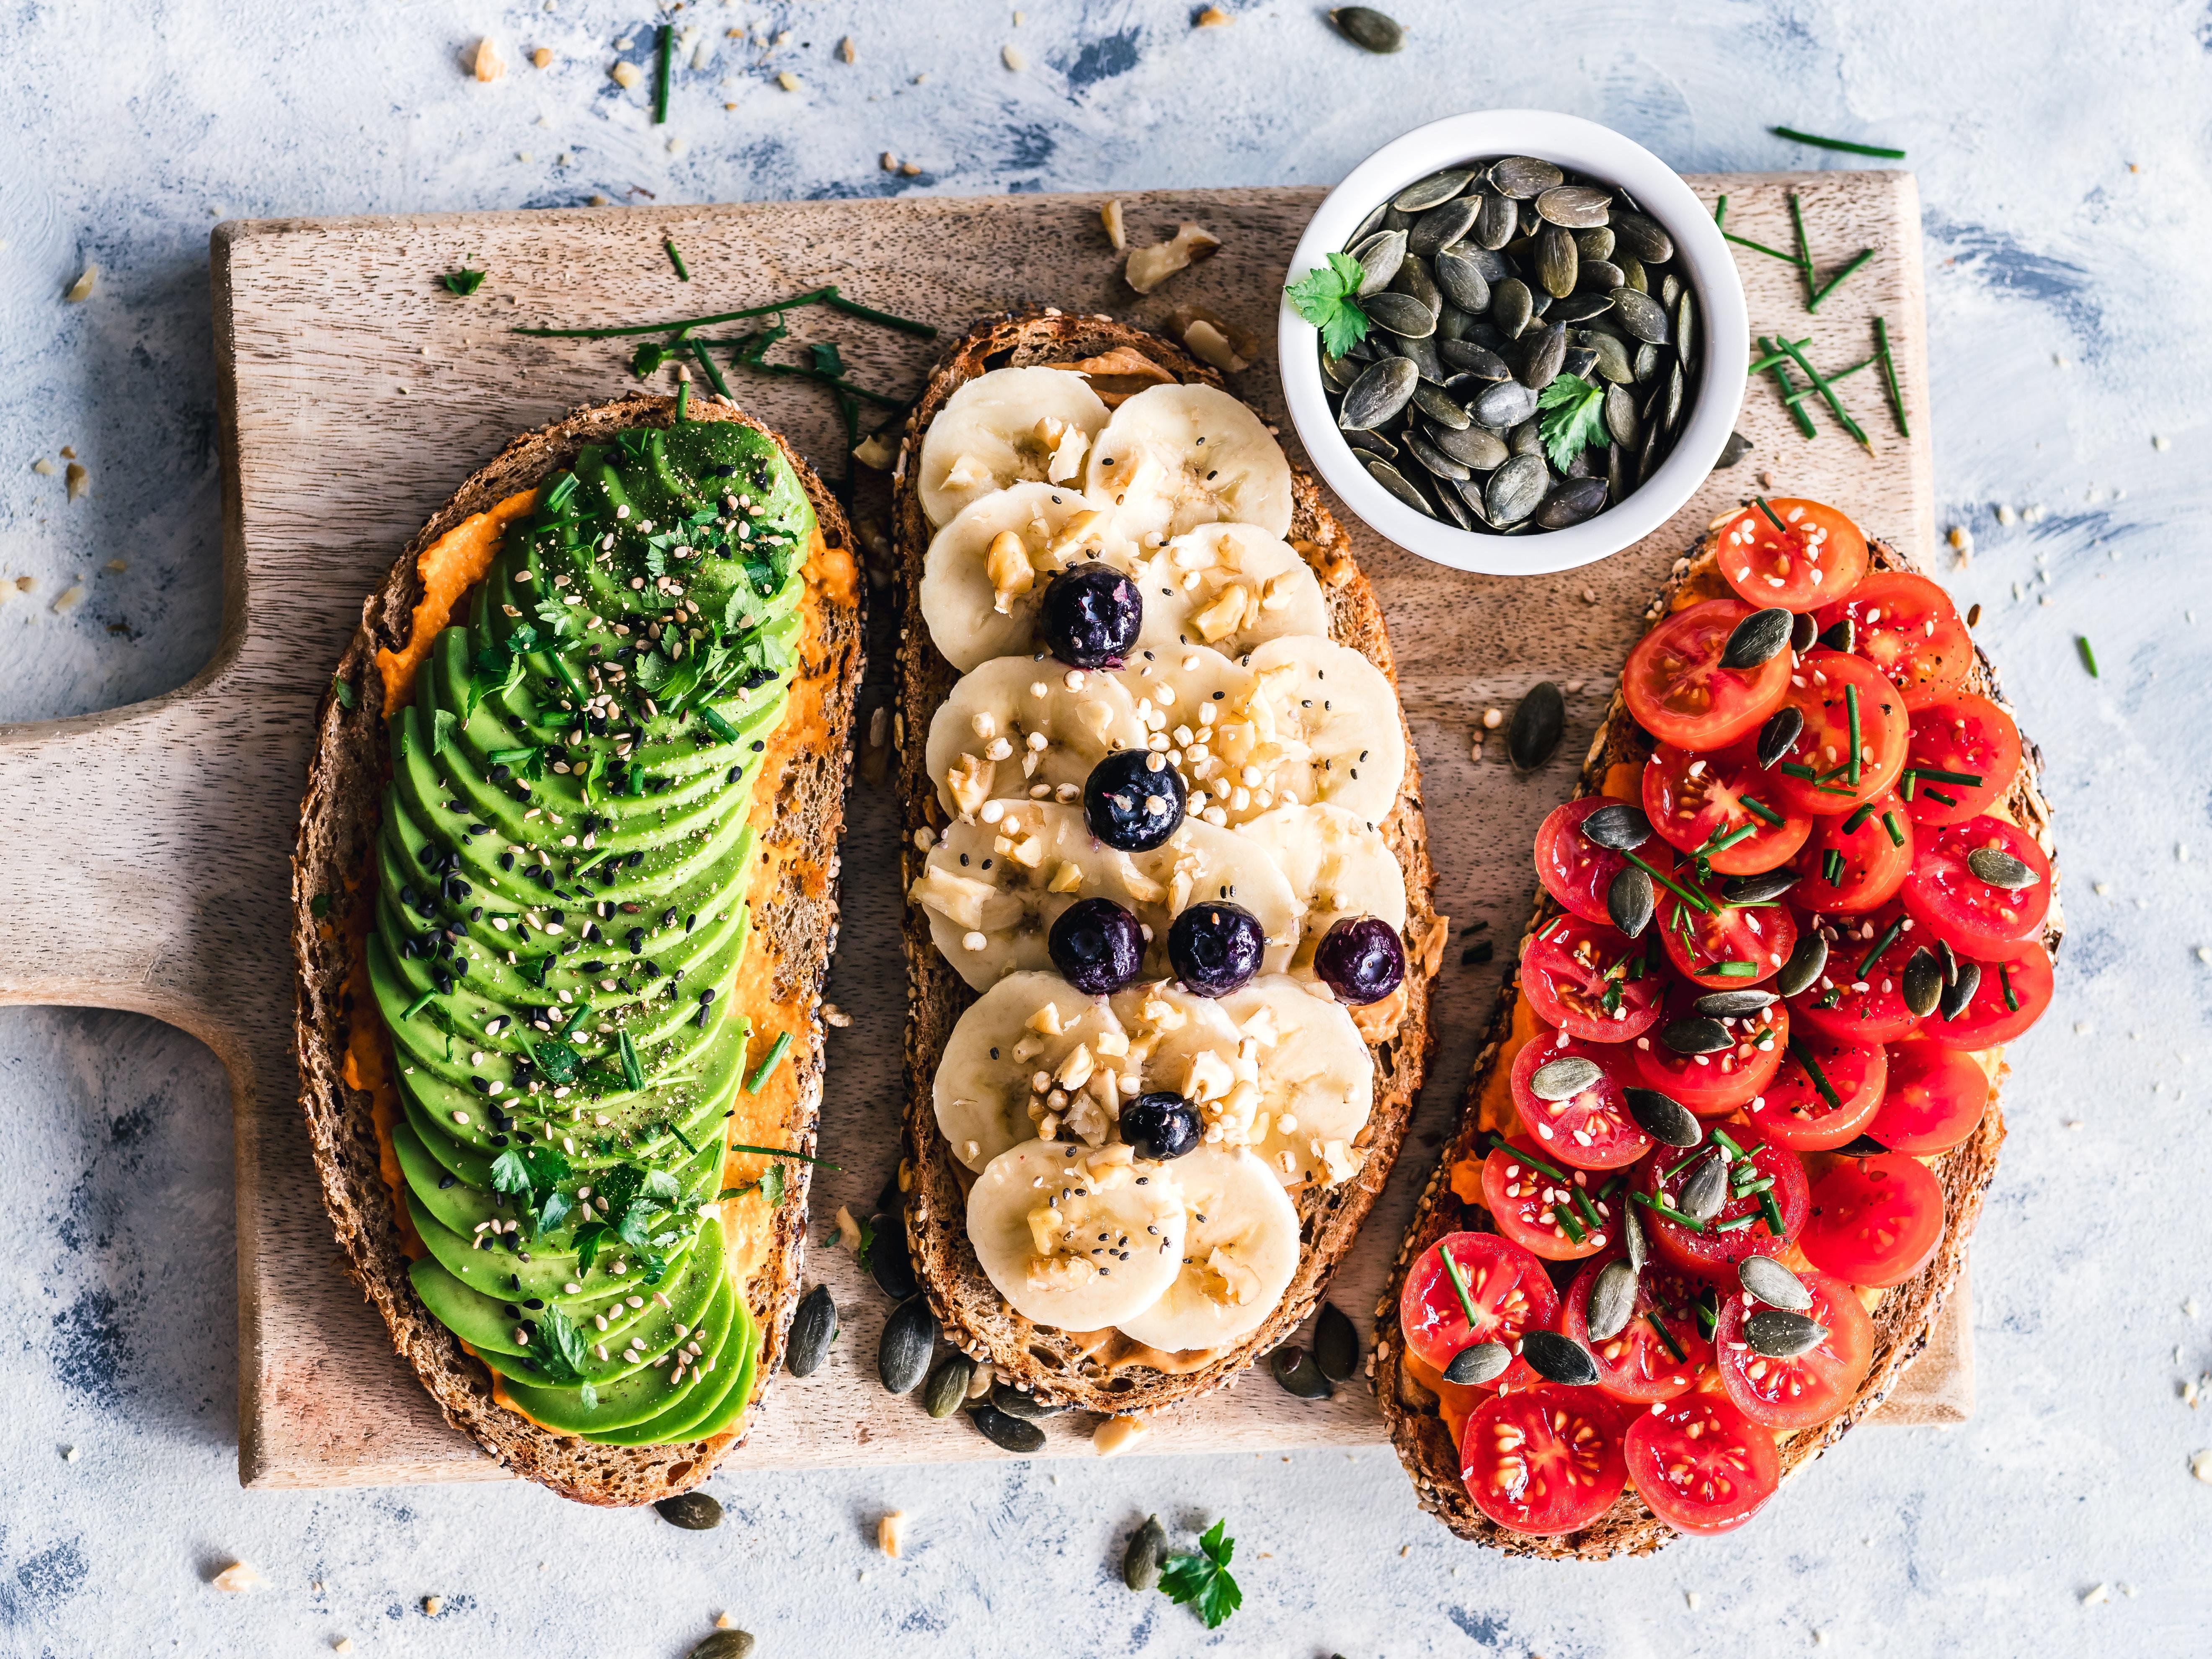 Free Intro to Plant Based Vegan Living